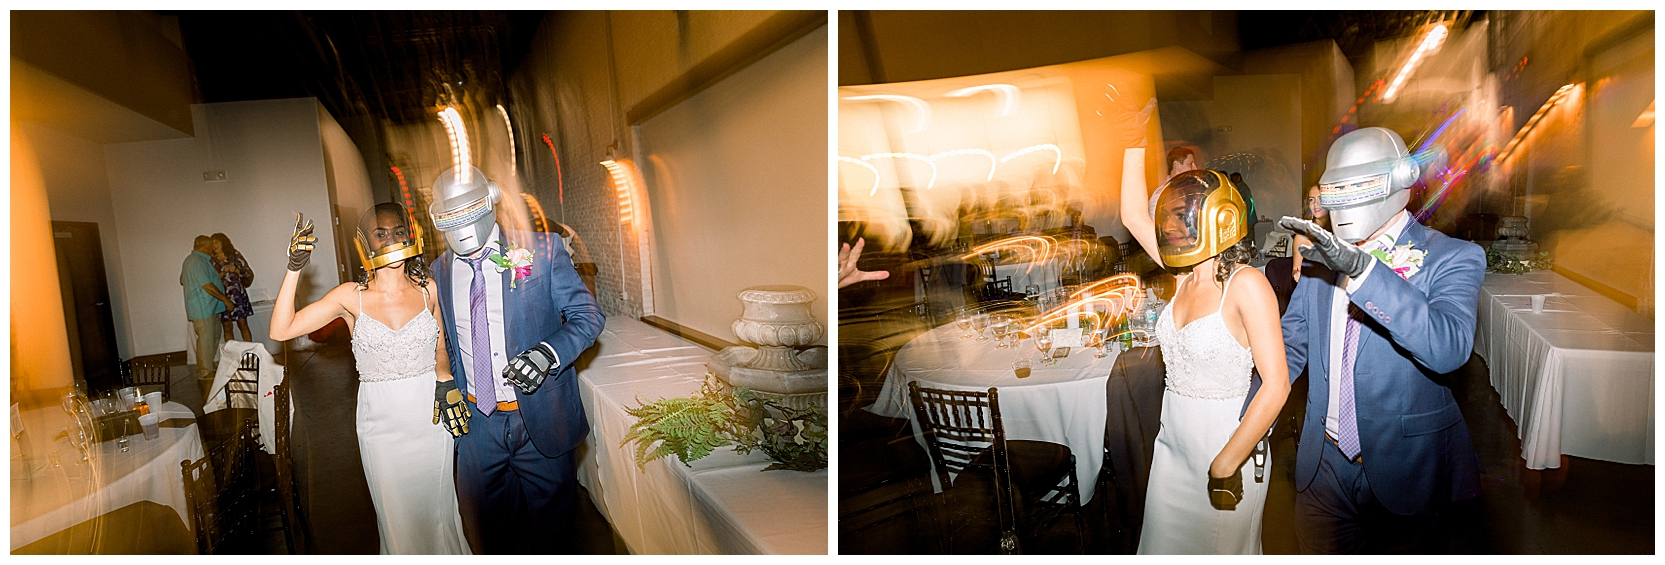 jessicafredericks_lakeland_tampa_wedding_purple_crazy hour_0089.jpg